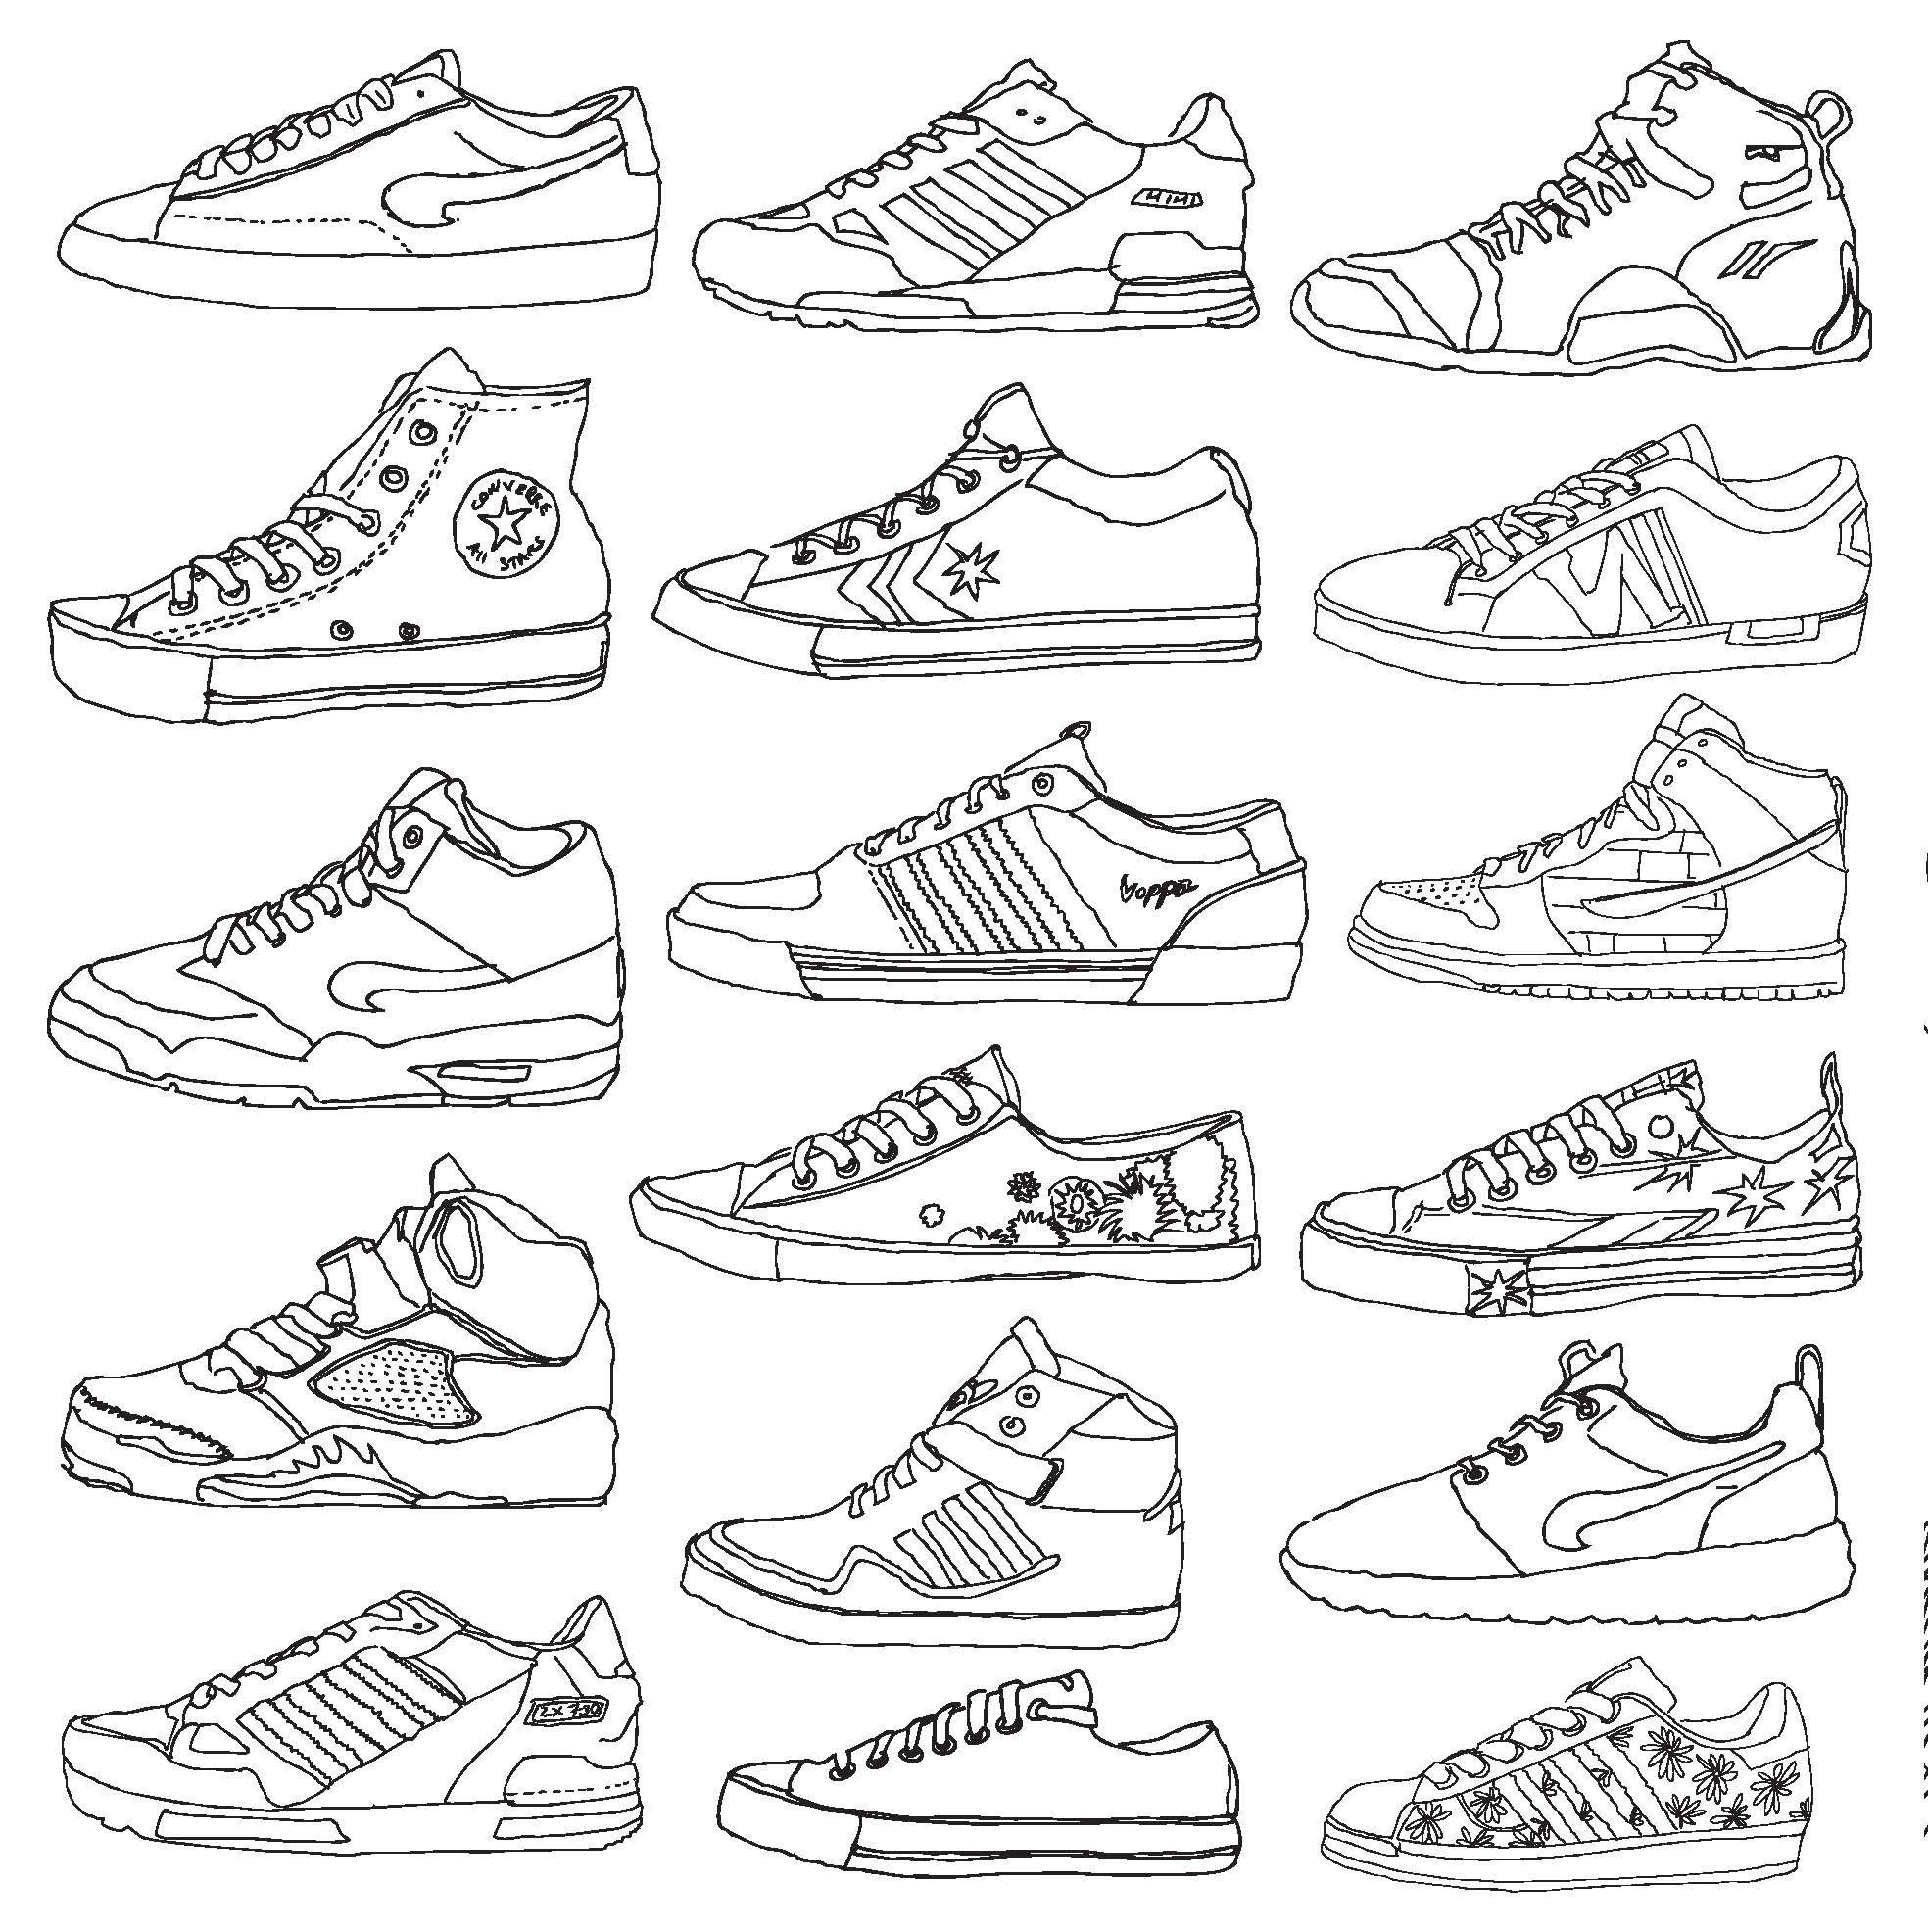 The sneaker coloring book pdf - Secret New York Color Your Way To Calm Zoe De Las Cases 9780316265836